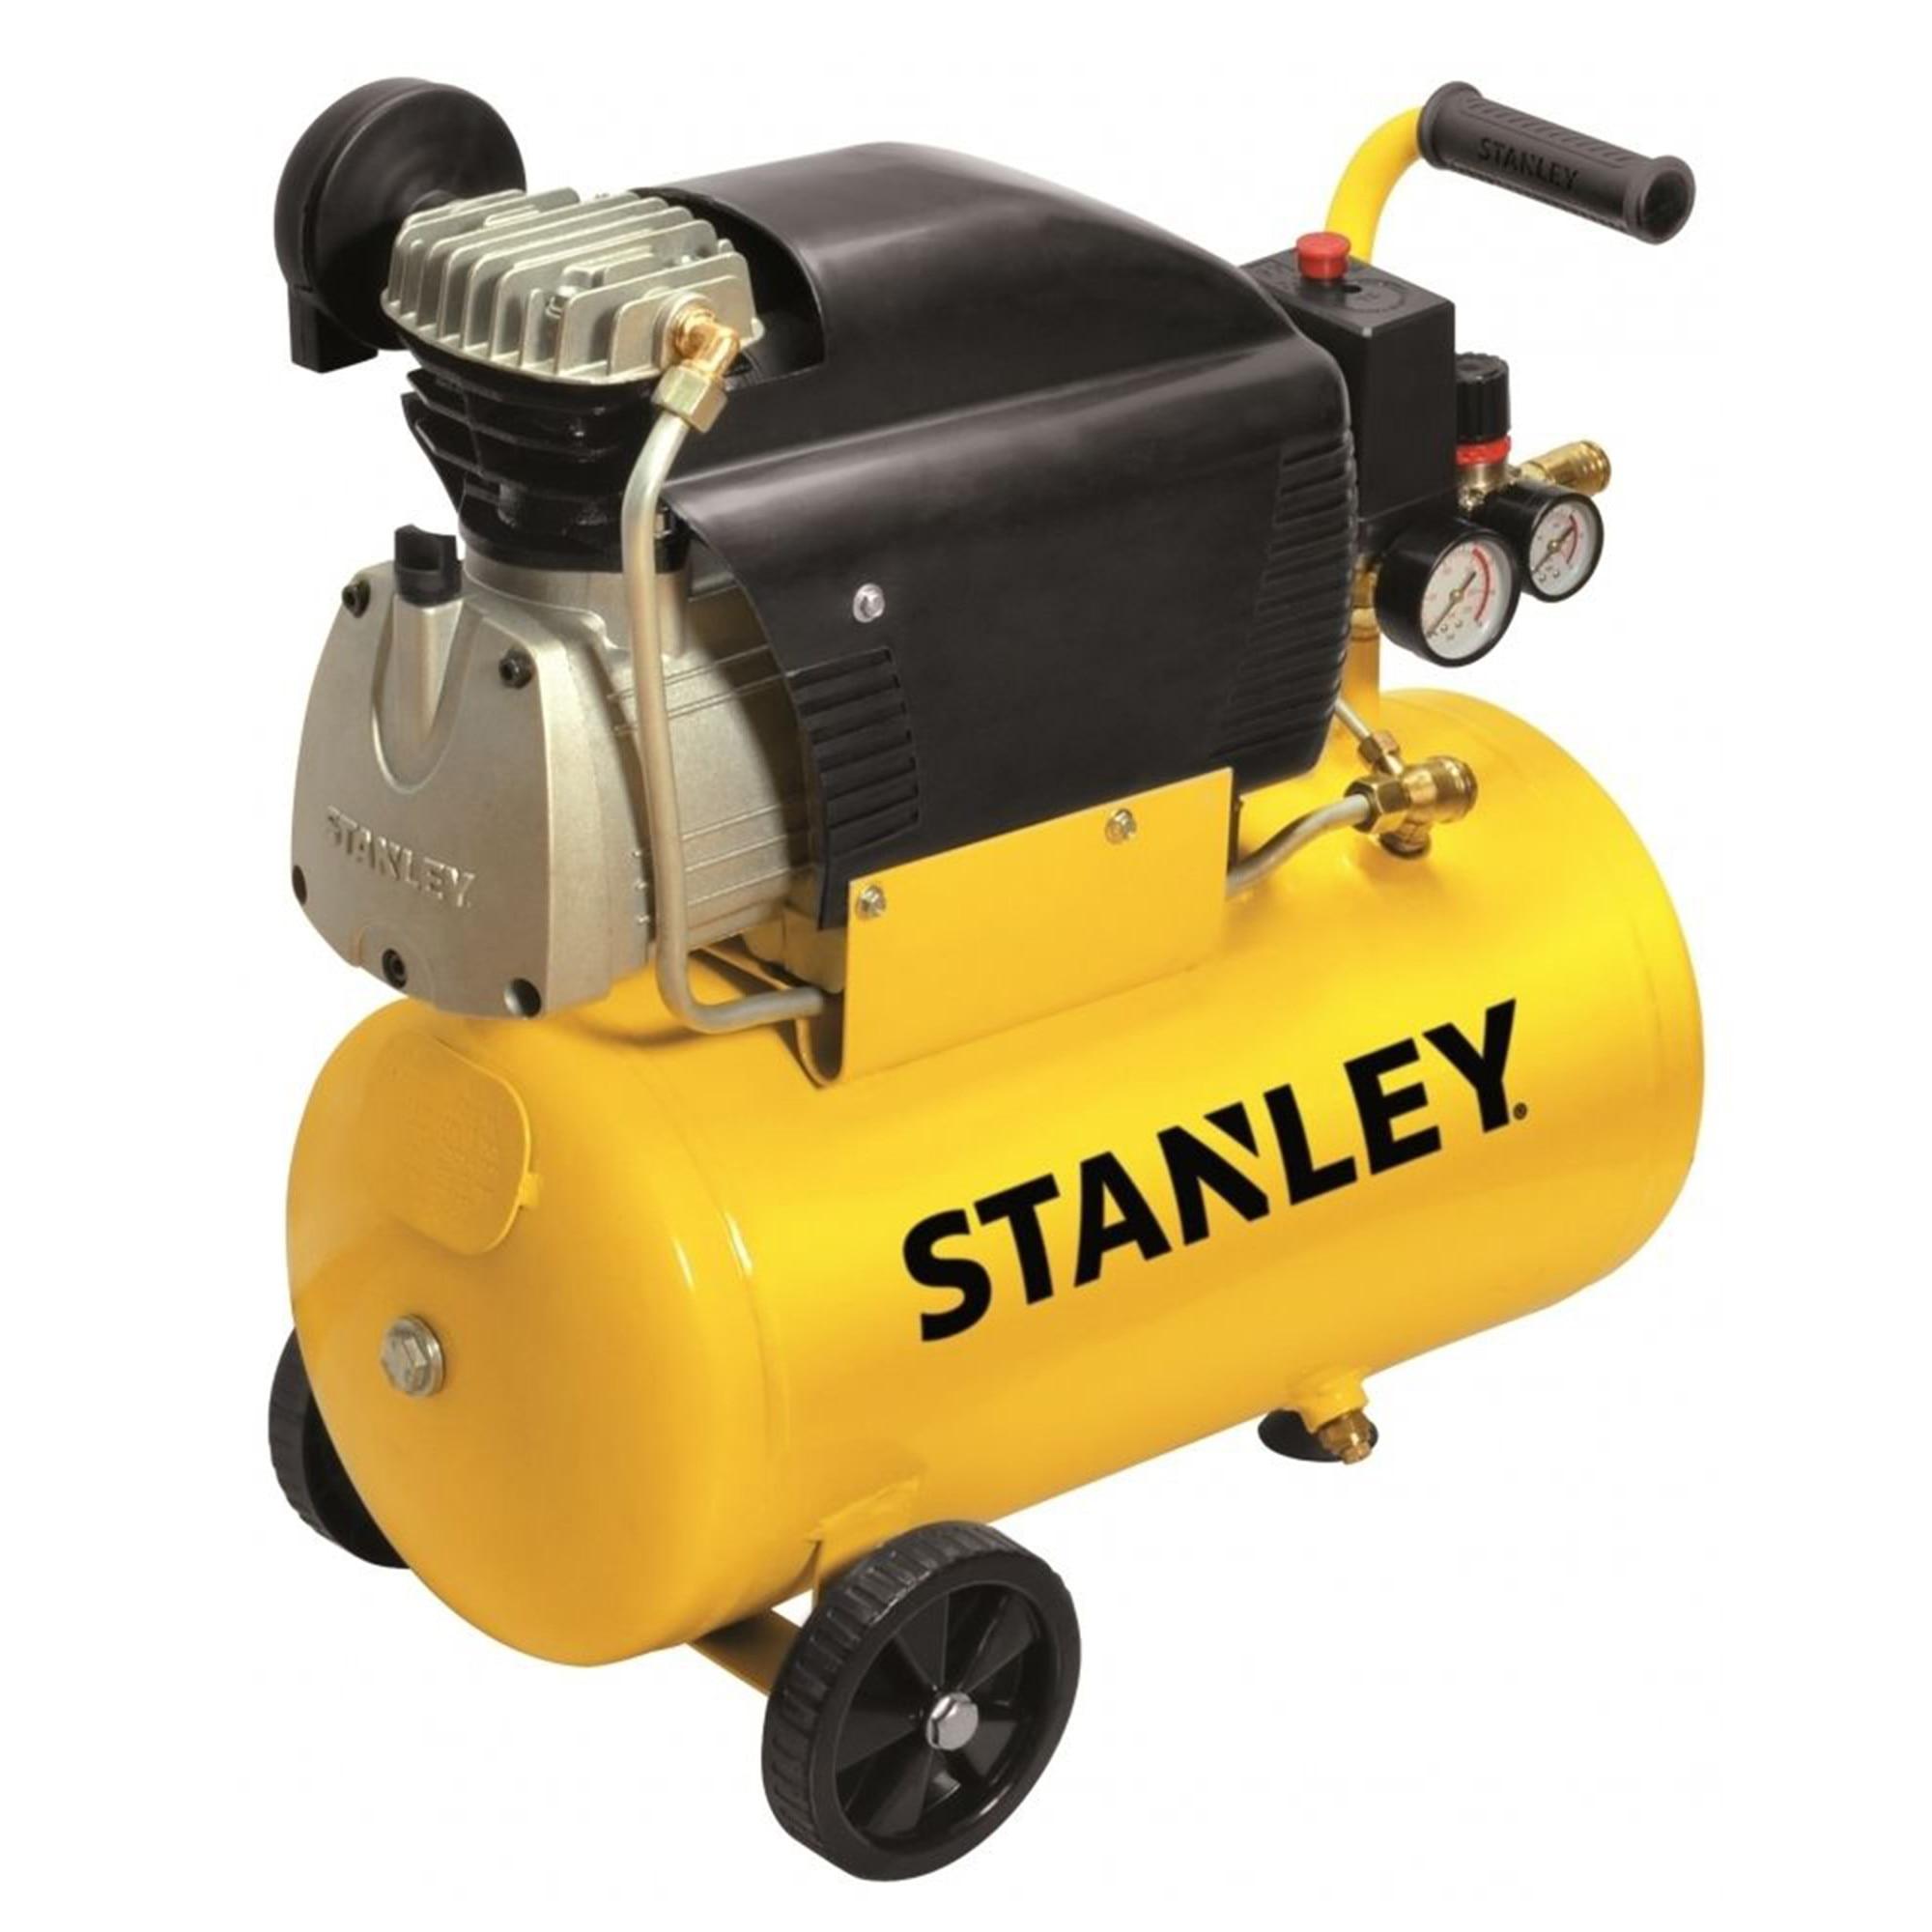 Fotografie Compresor aer profesional Stanley D210, 2 CP, 24 l capacitate rezervor, 8 bar presiune lucru, 222 l/min debit aer